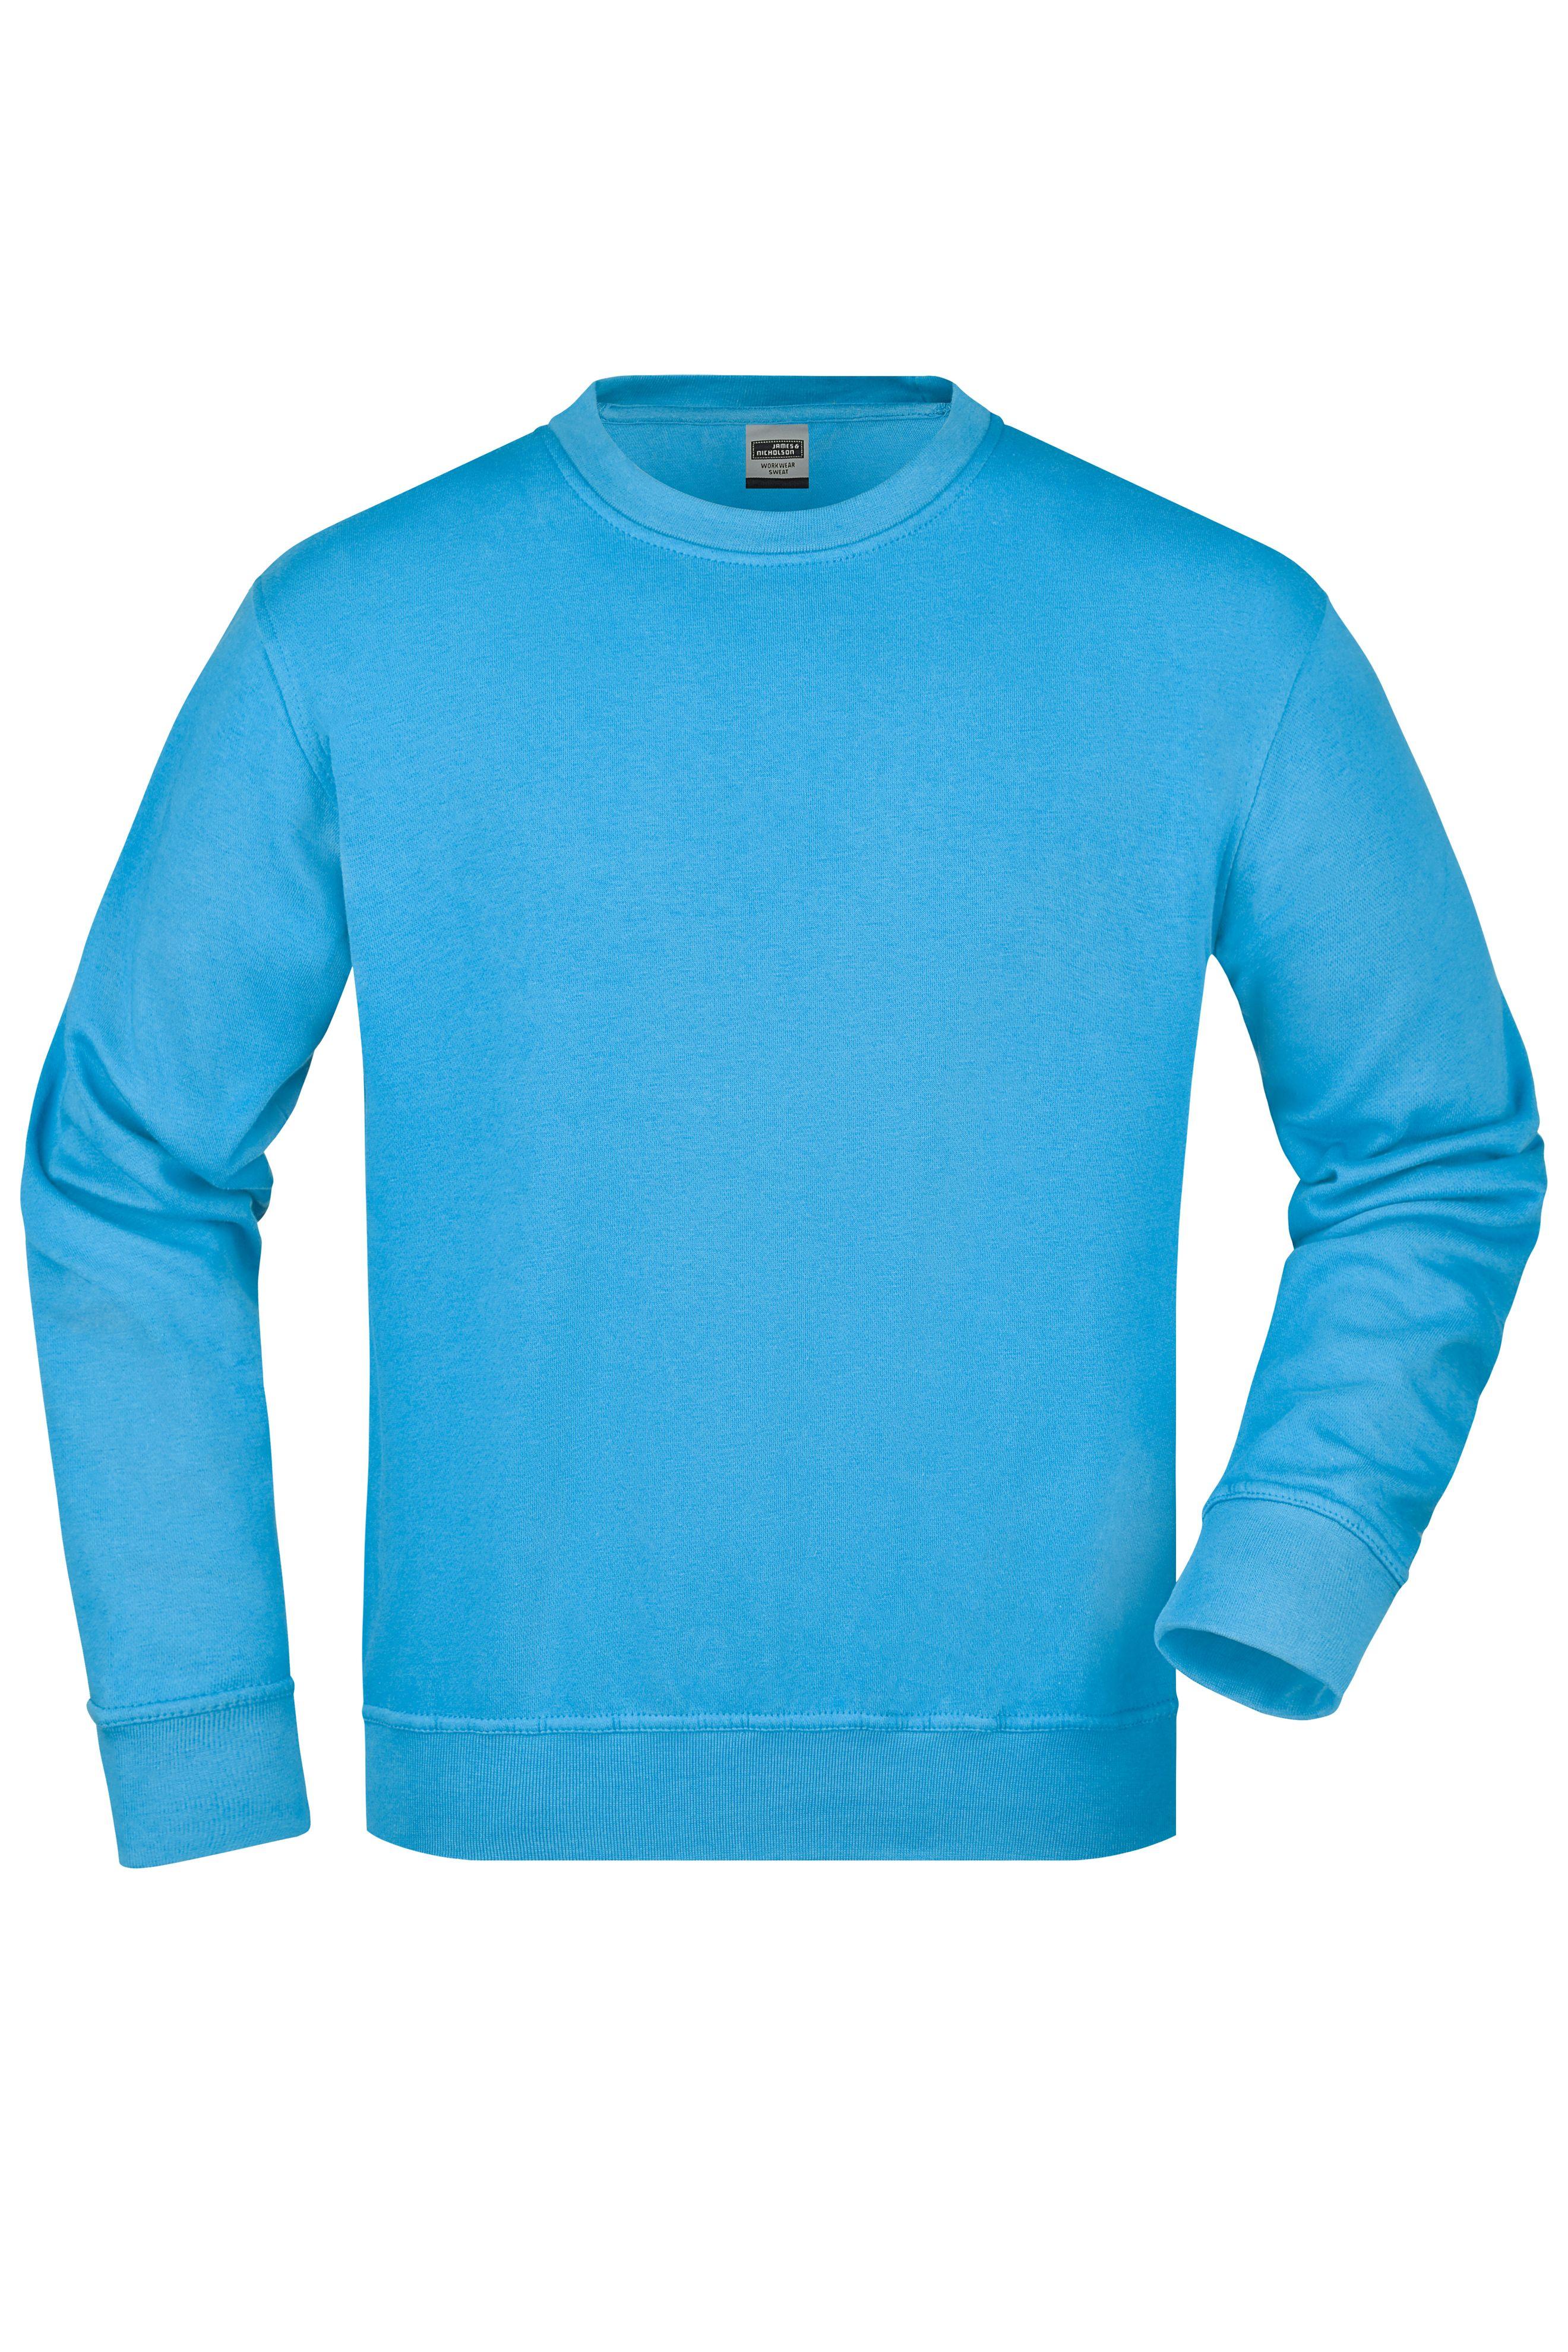 Klassisches Rundhals-Sweatshirt